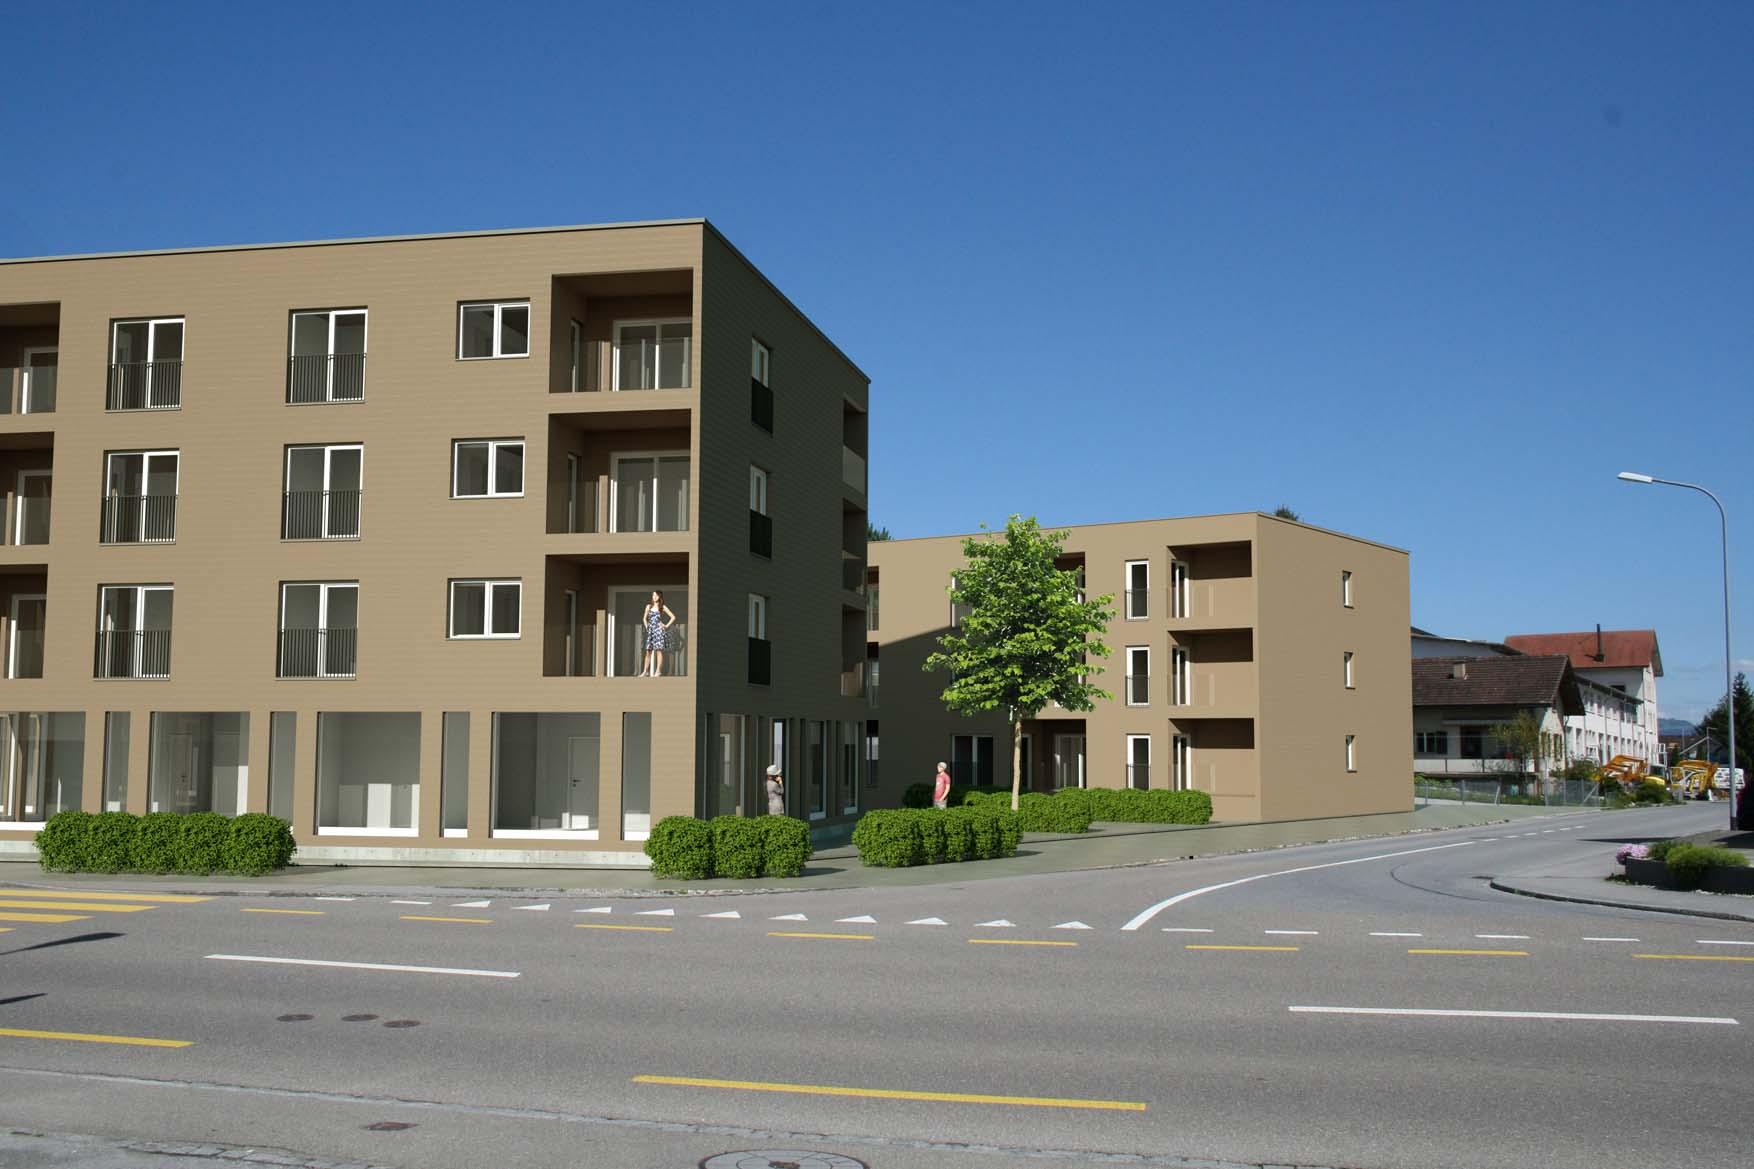 Wohnüberbauung 2 MFH <br/> 9443 Widnau